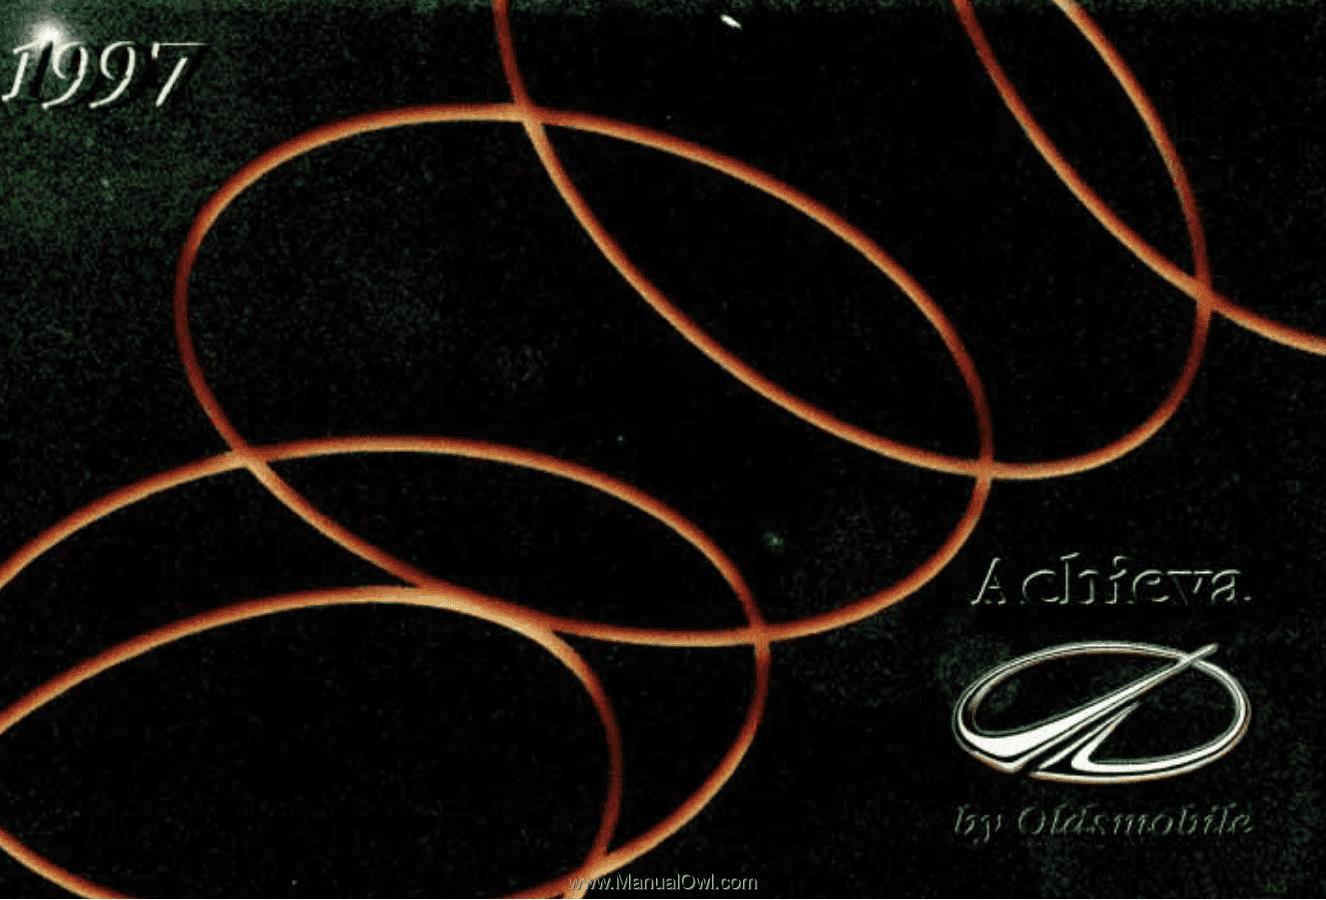 A1a7f 1997 Oldsmobile Achieva Fuse Box Wiring Library